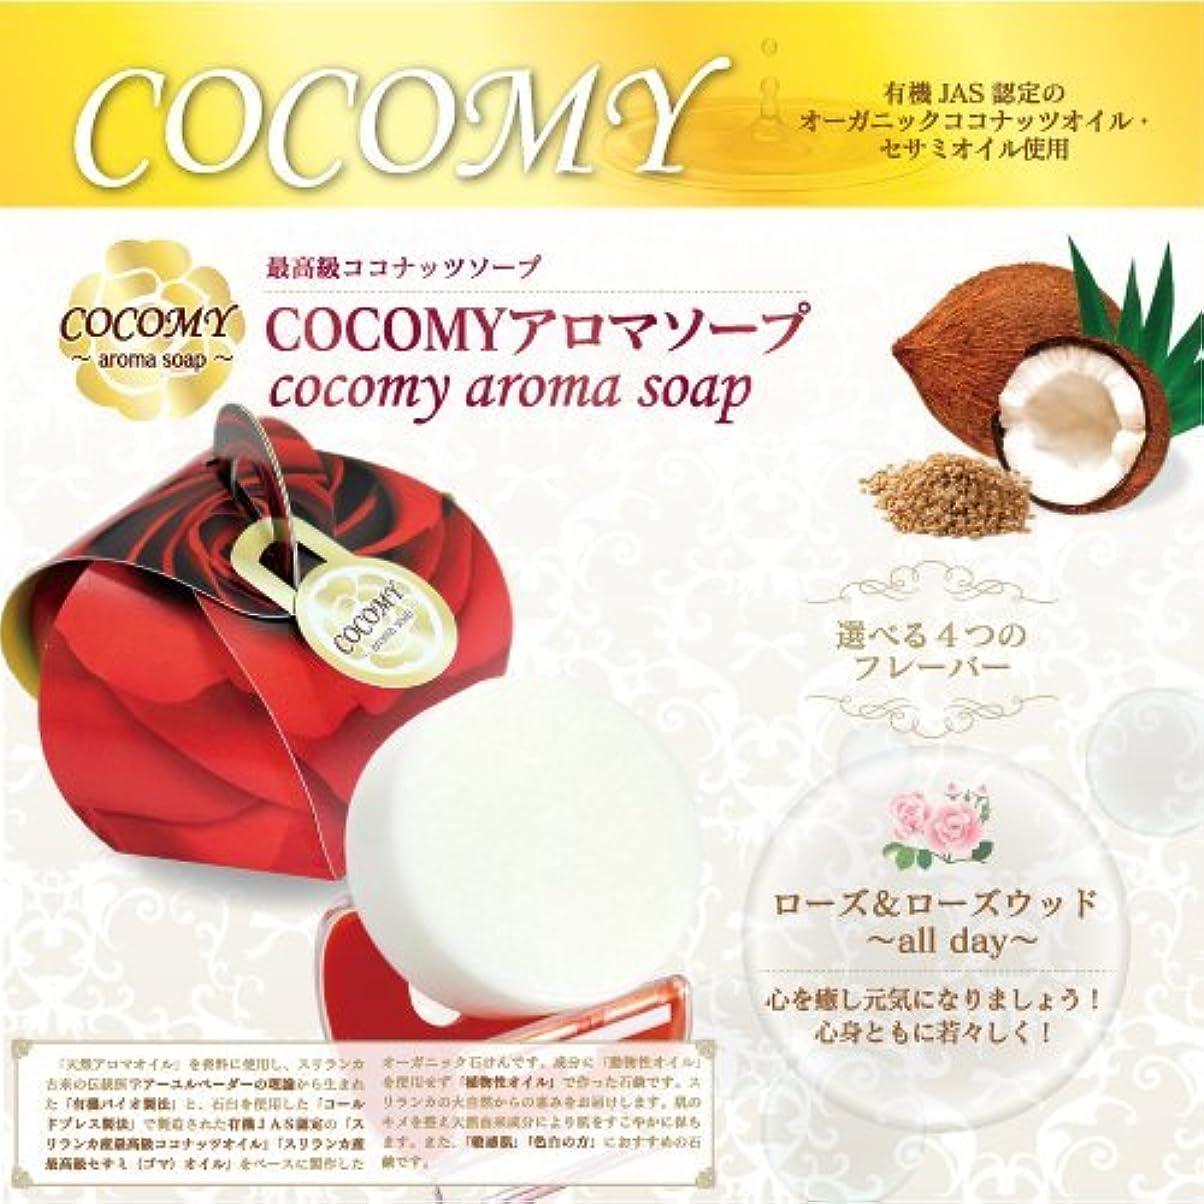 COCOMY aromaソープ (ローズ&ローズウッド) 40g